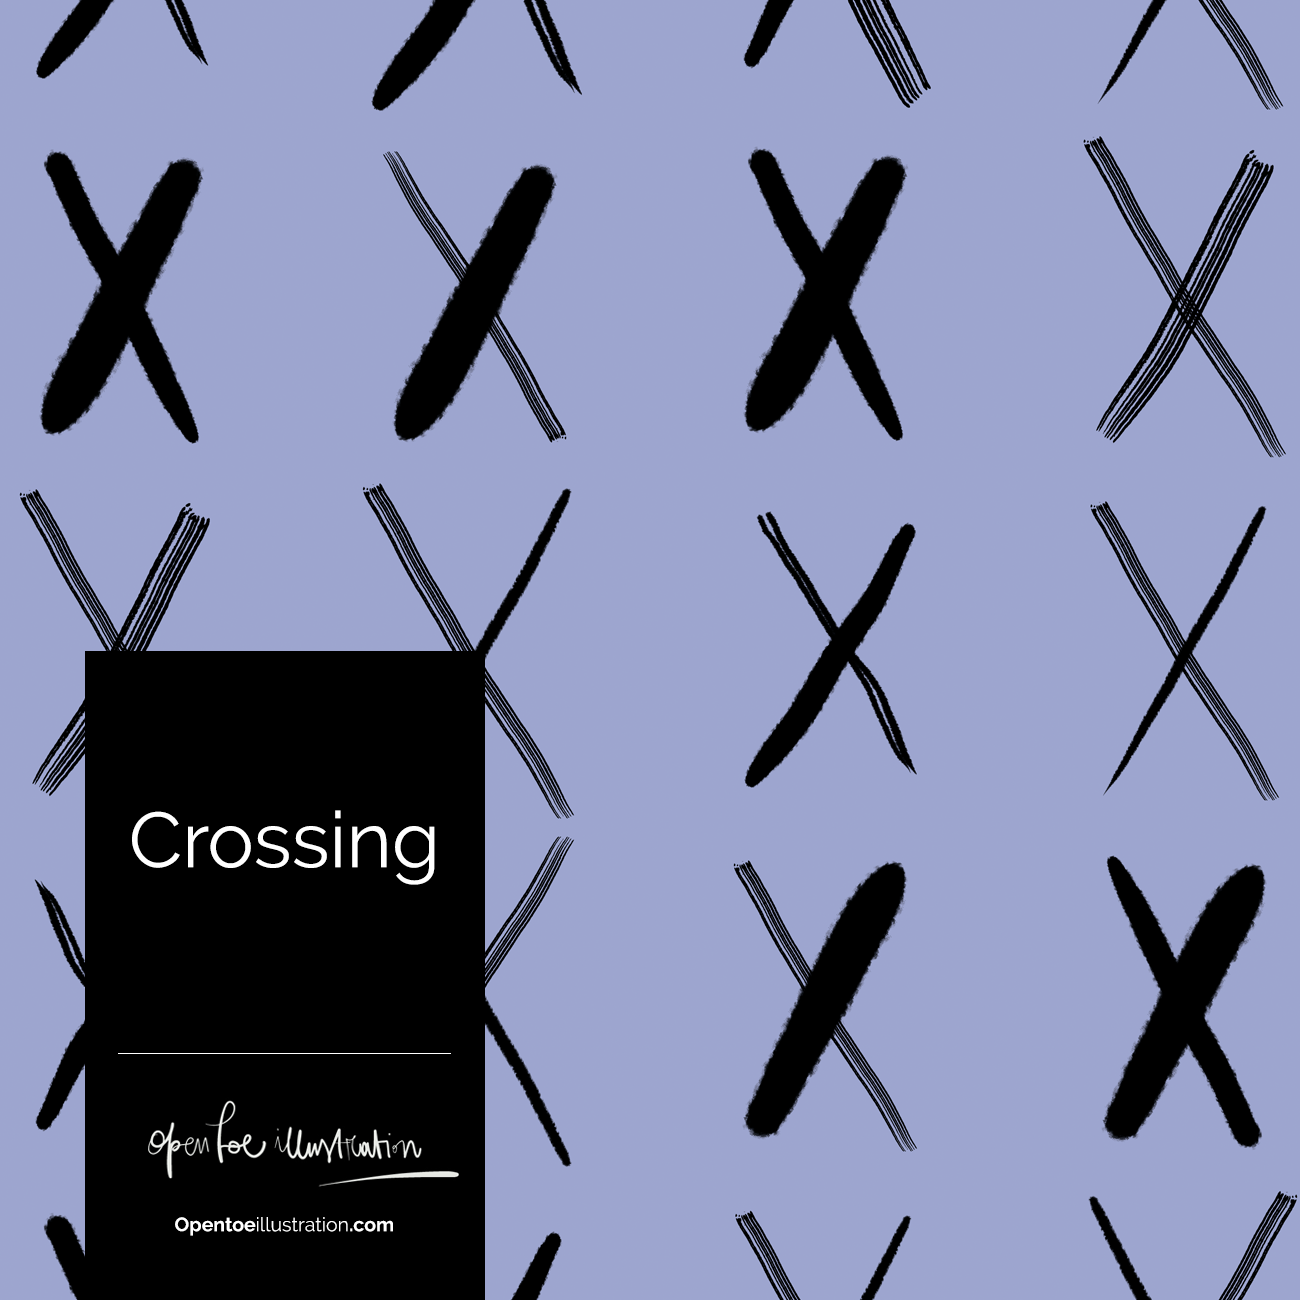 Crossing Pattern by Silvana Mariani